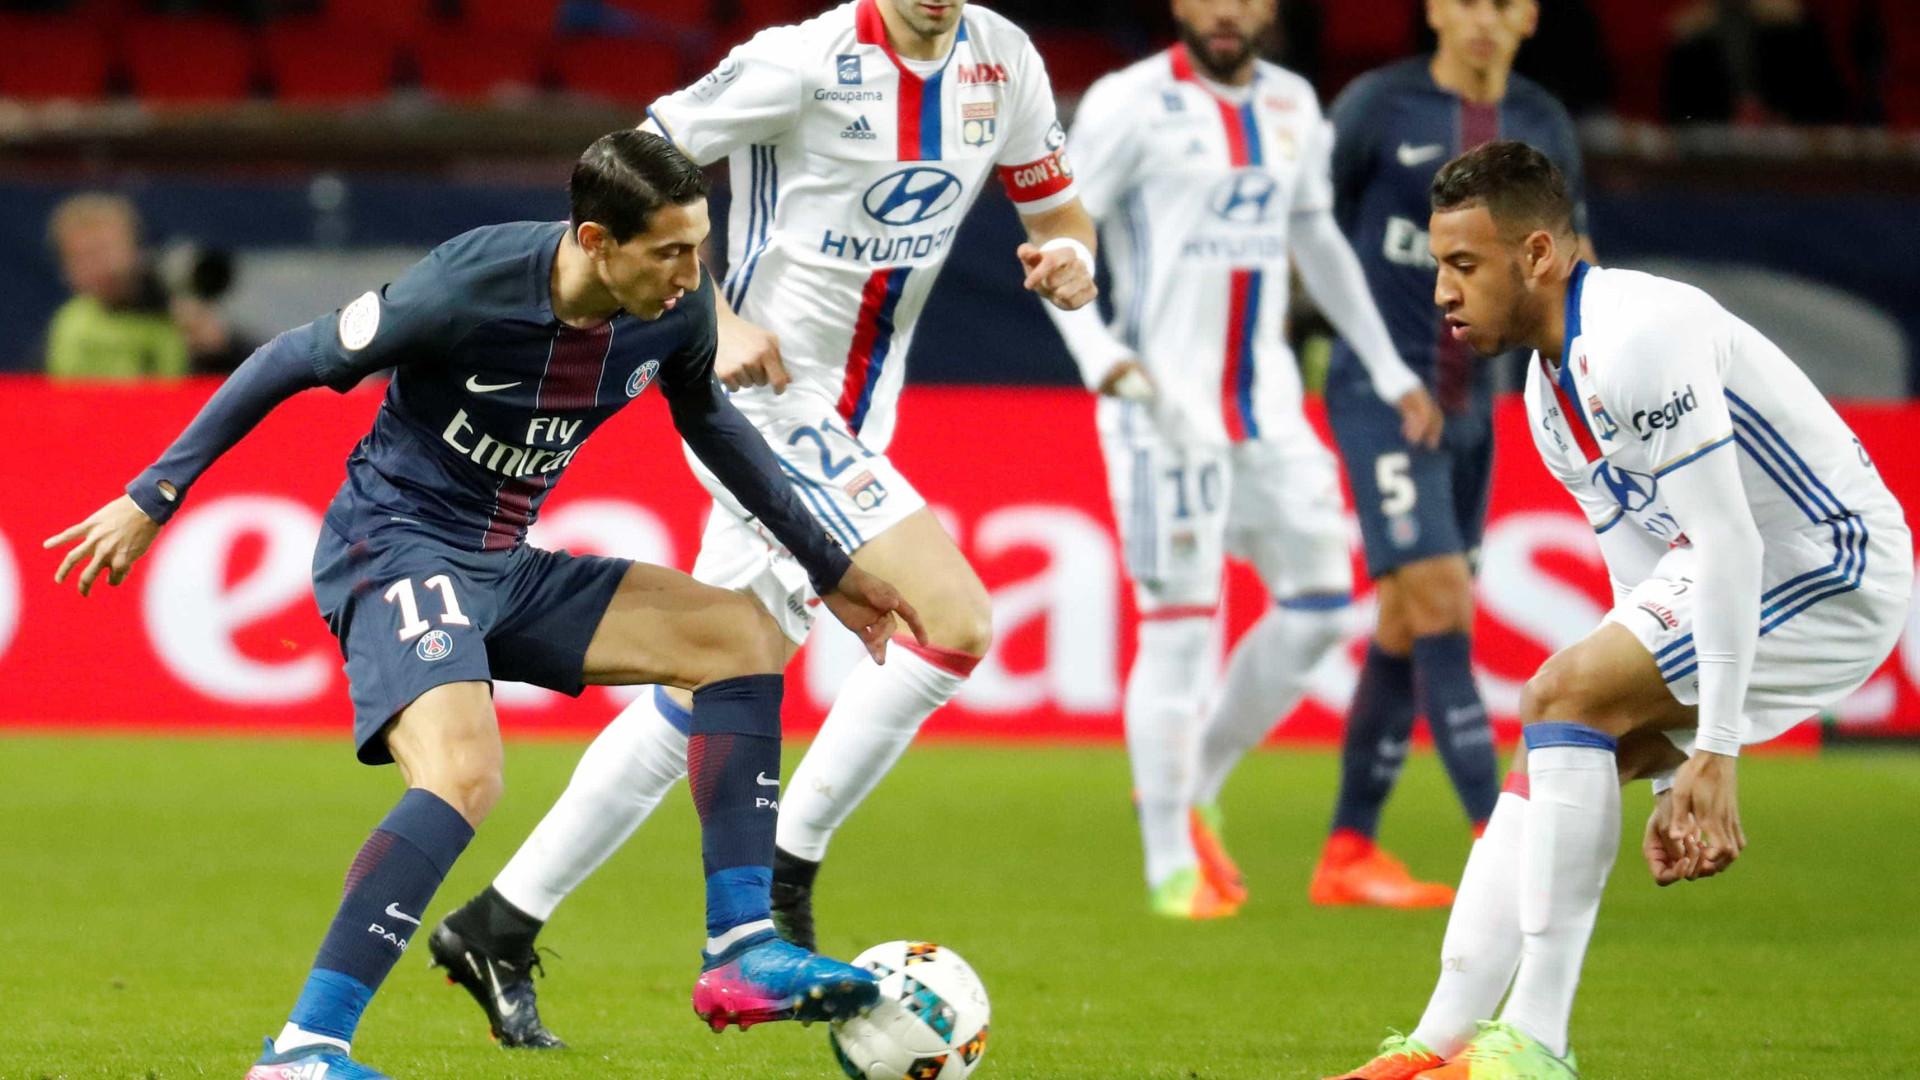 Paris Saint-Germain vence Lyon e mantém pressão sobre líder Mónaco